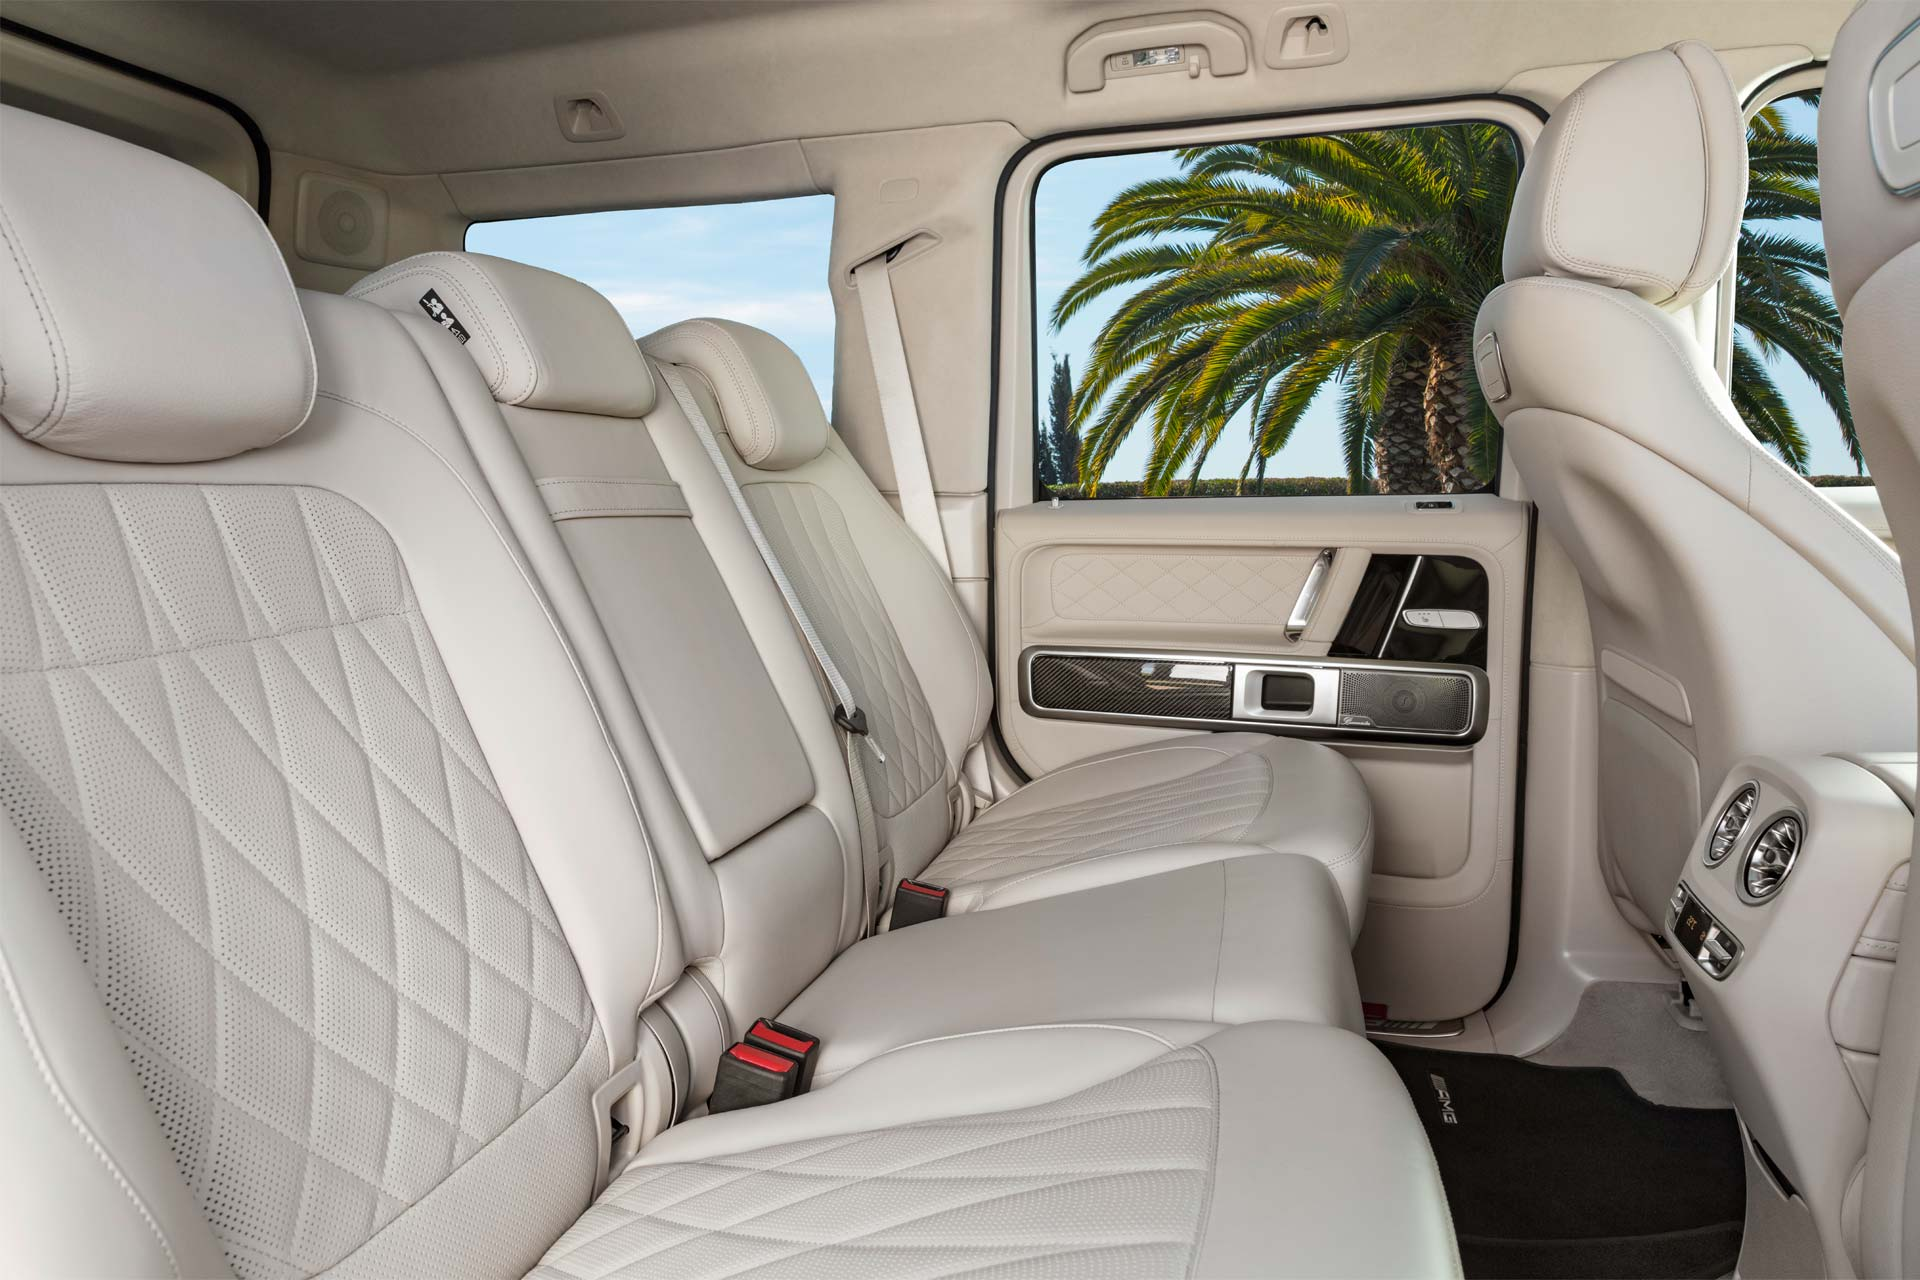 2018-Mercedes-AMG-G-63-Interior_4